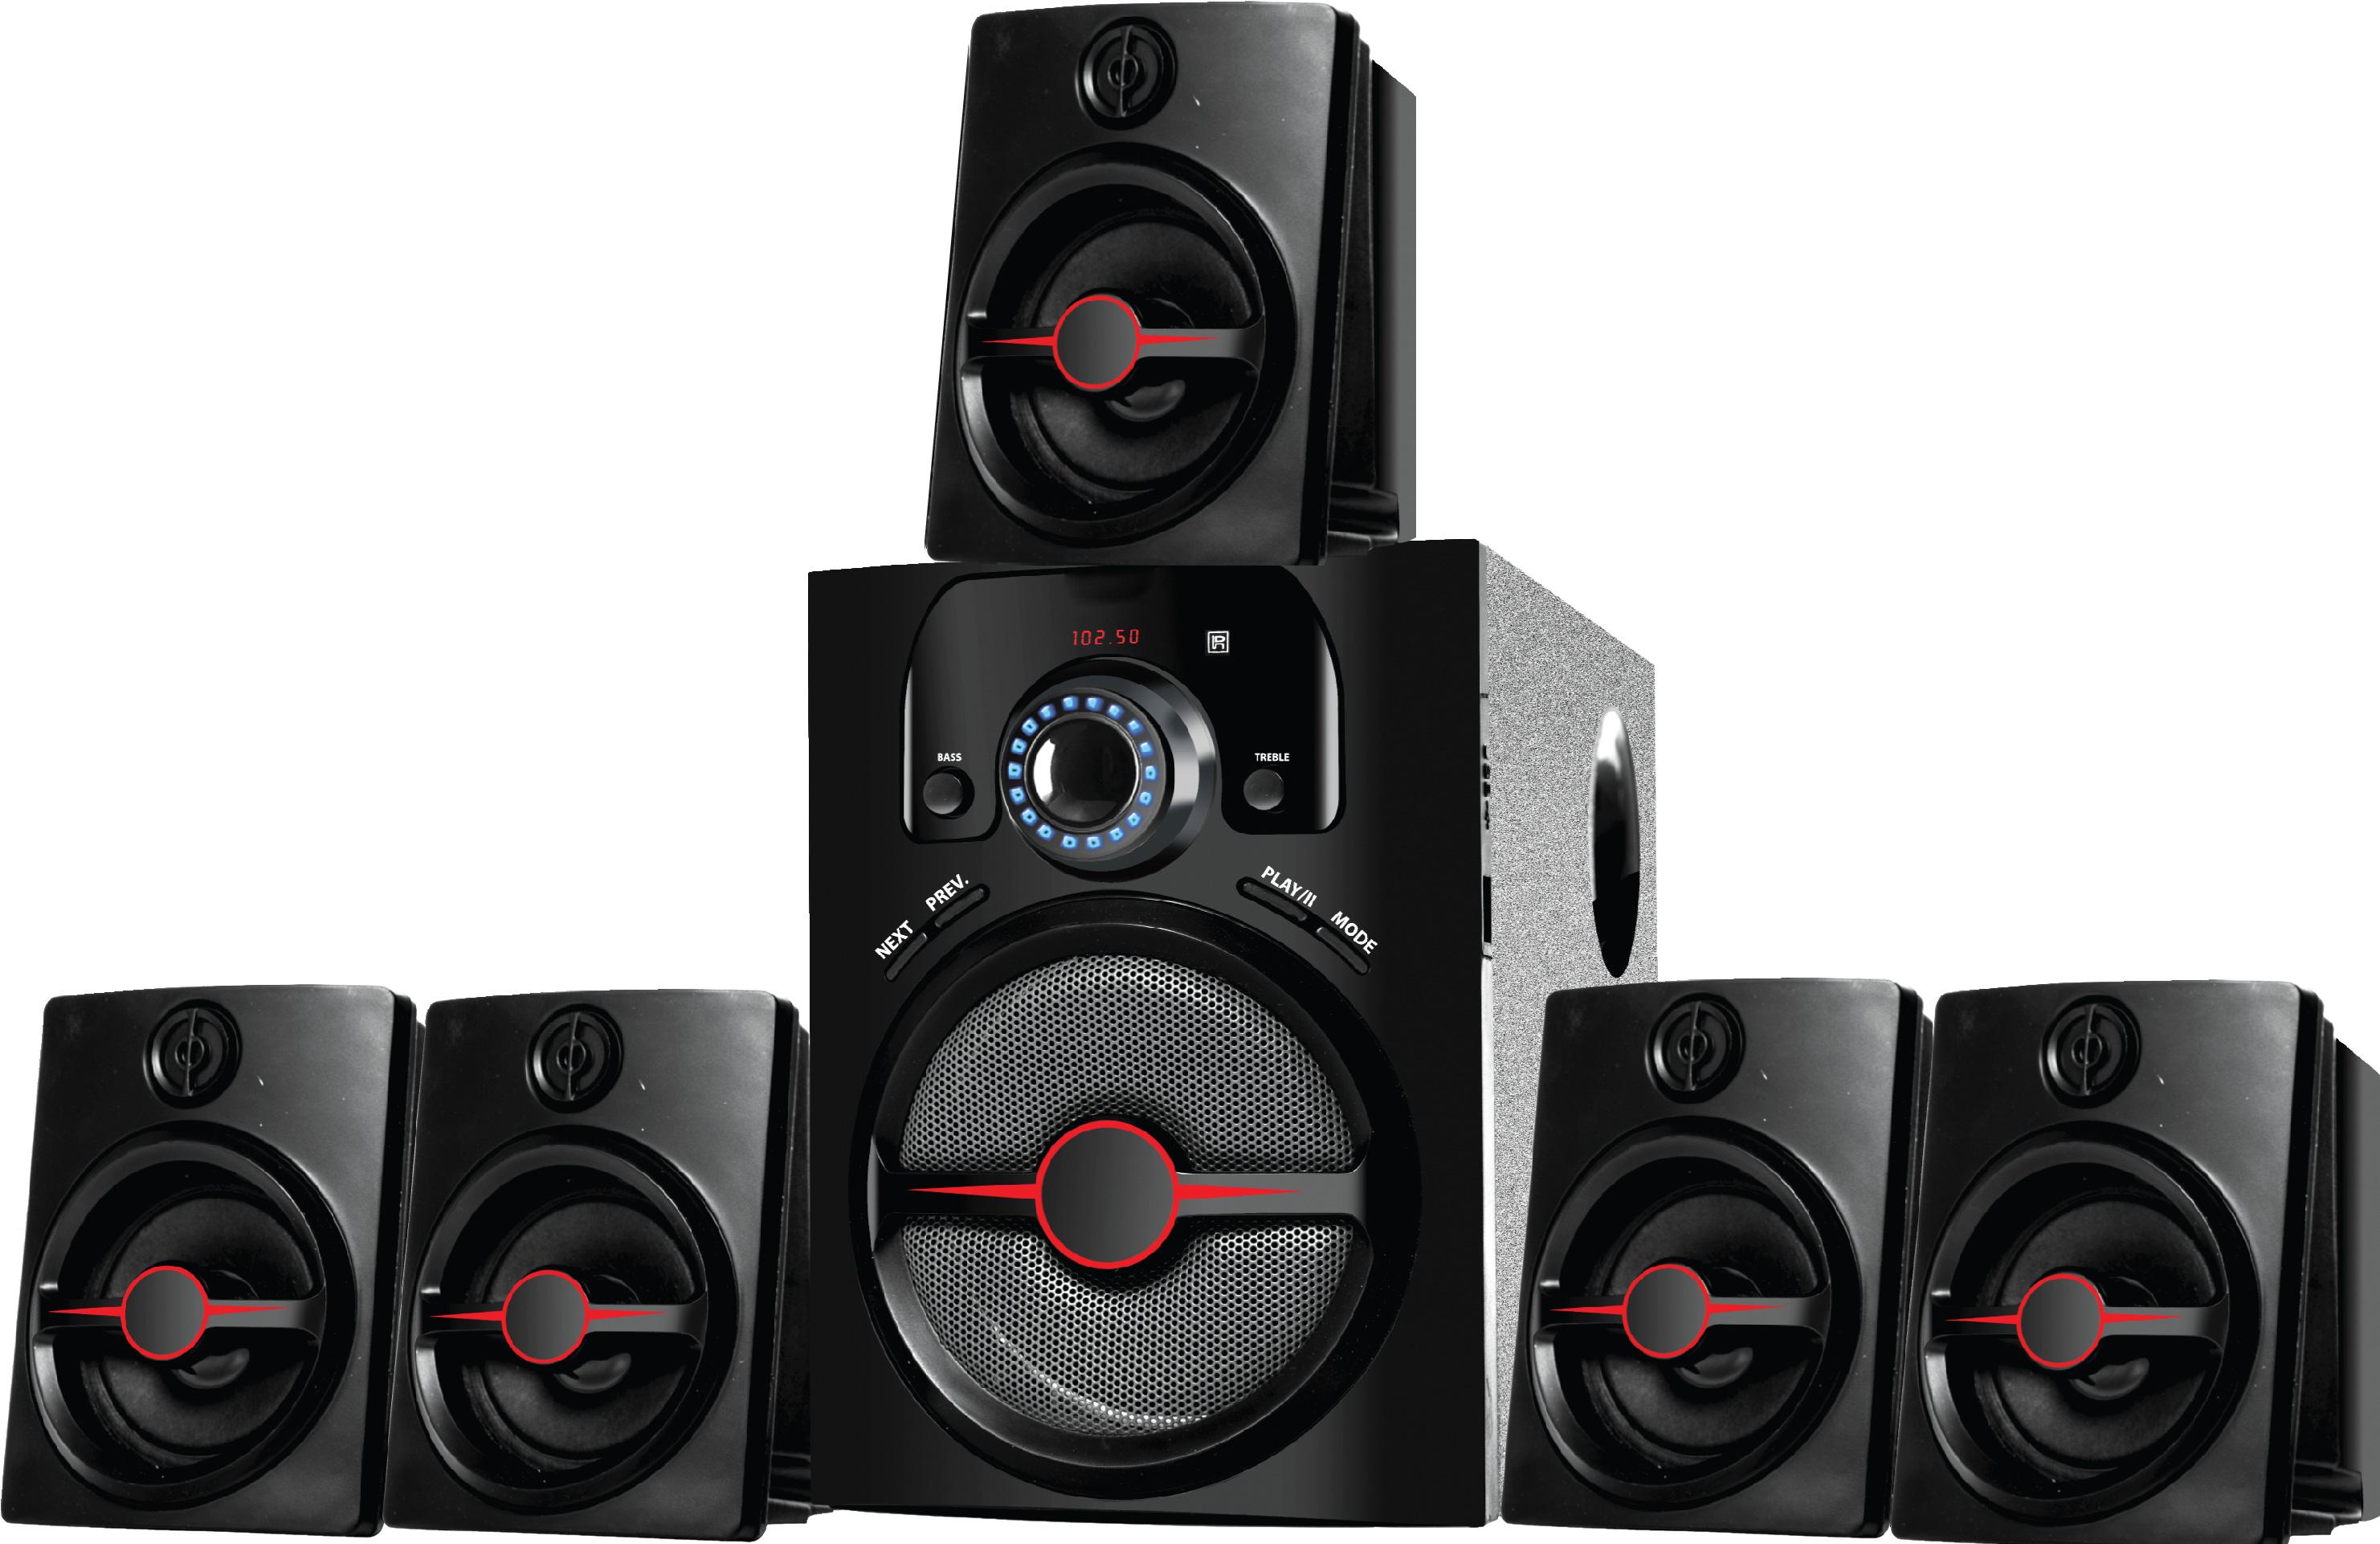 Ikall IK 444 BT Bluetooth Home Audio/Speaker System  Black, 5.1 Channels